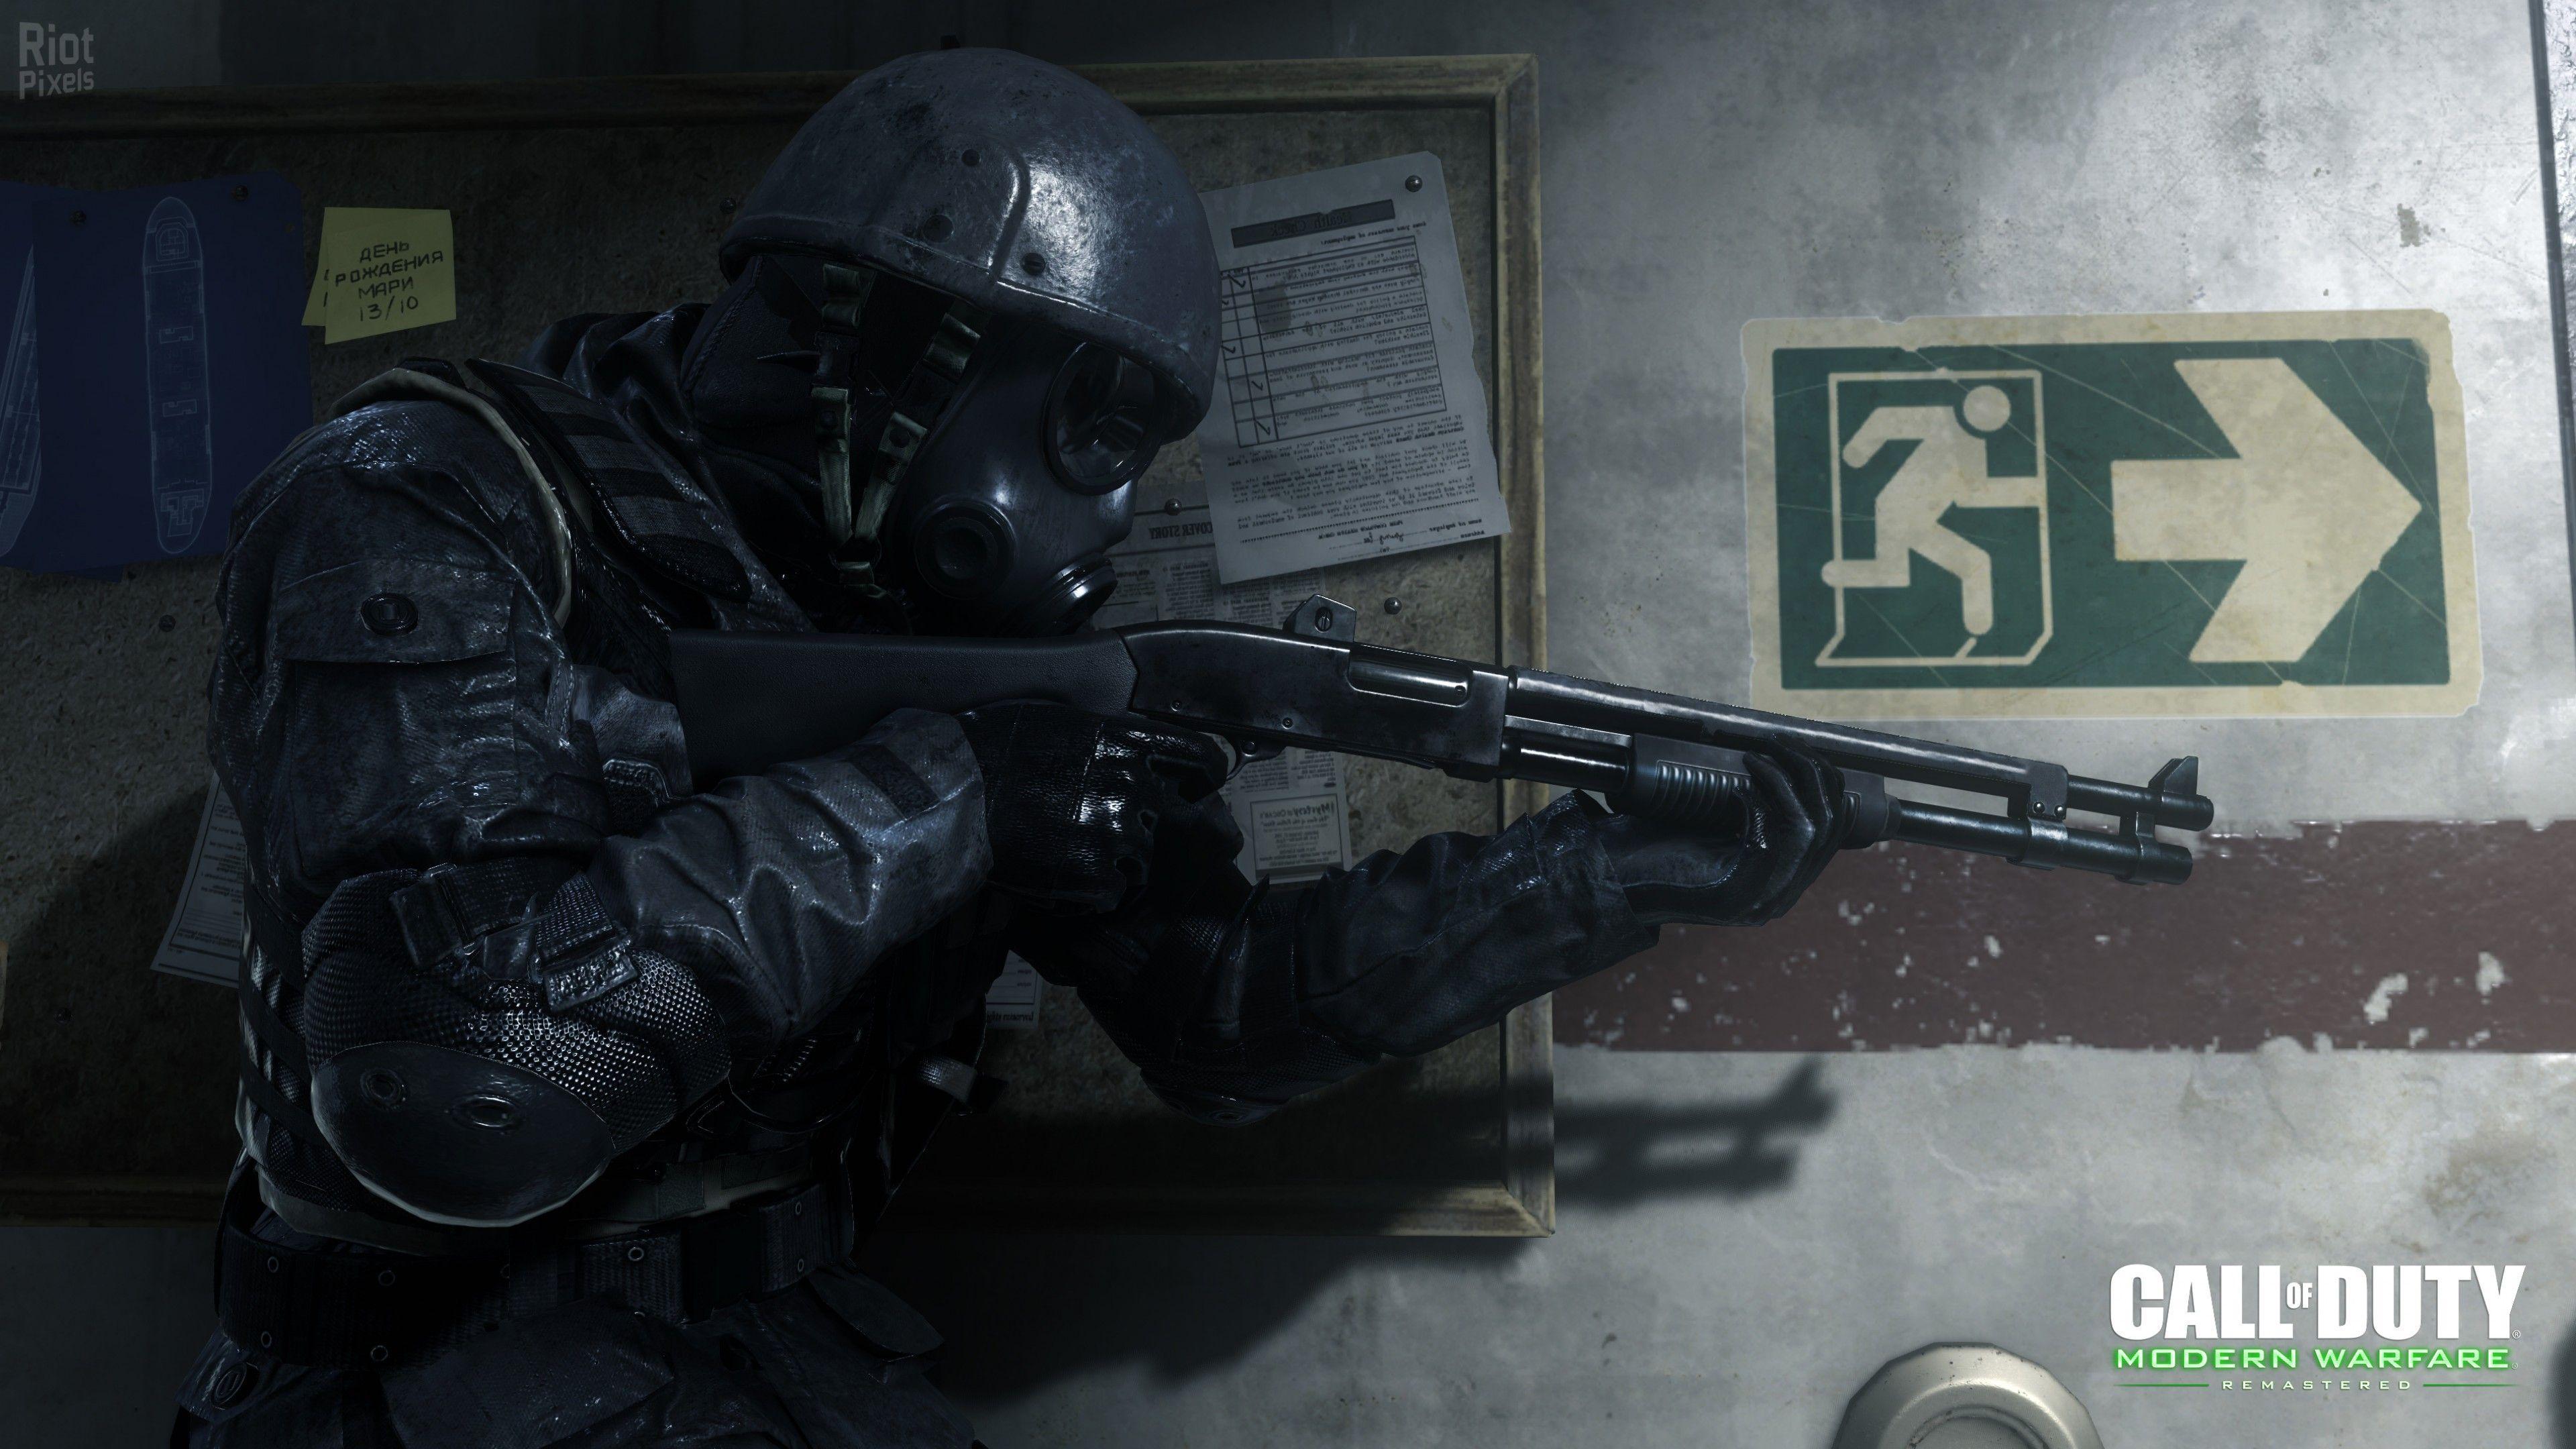 Call Of Duty 4 Modern Warfare Wallpapers Wallpaper Cave